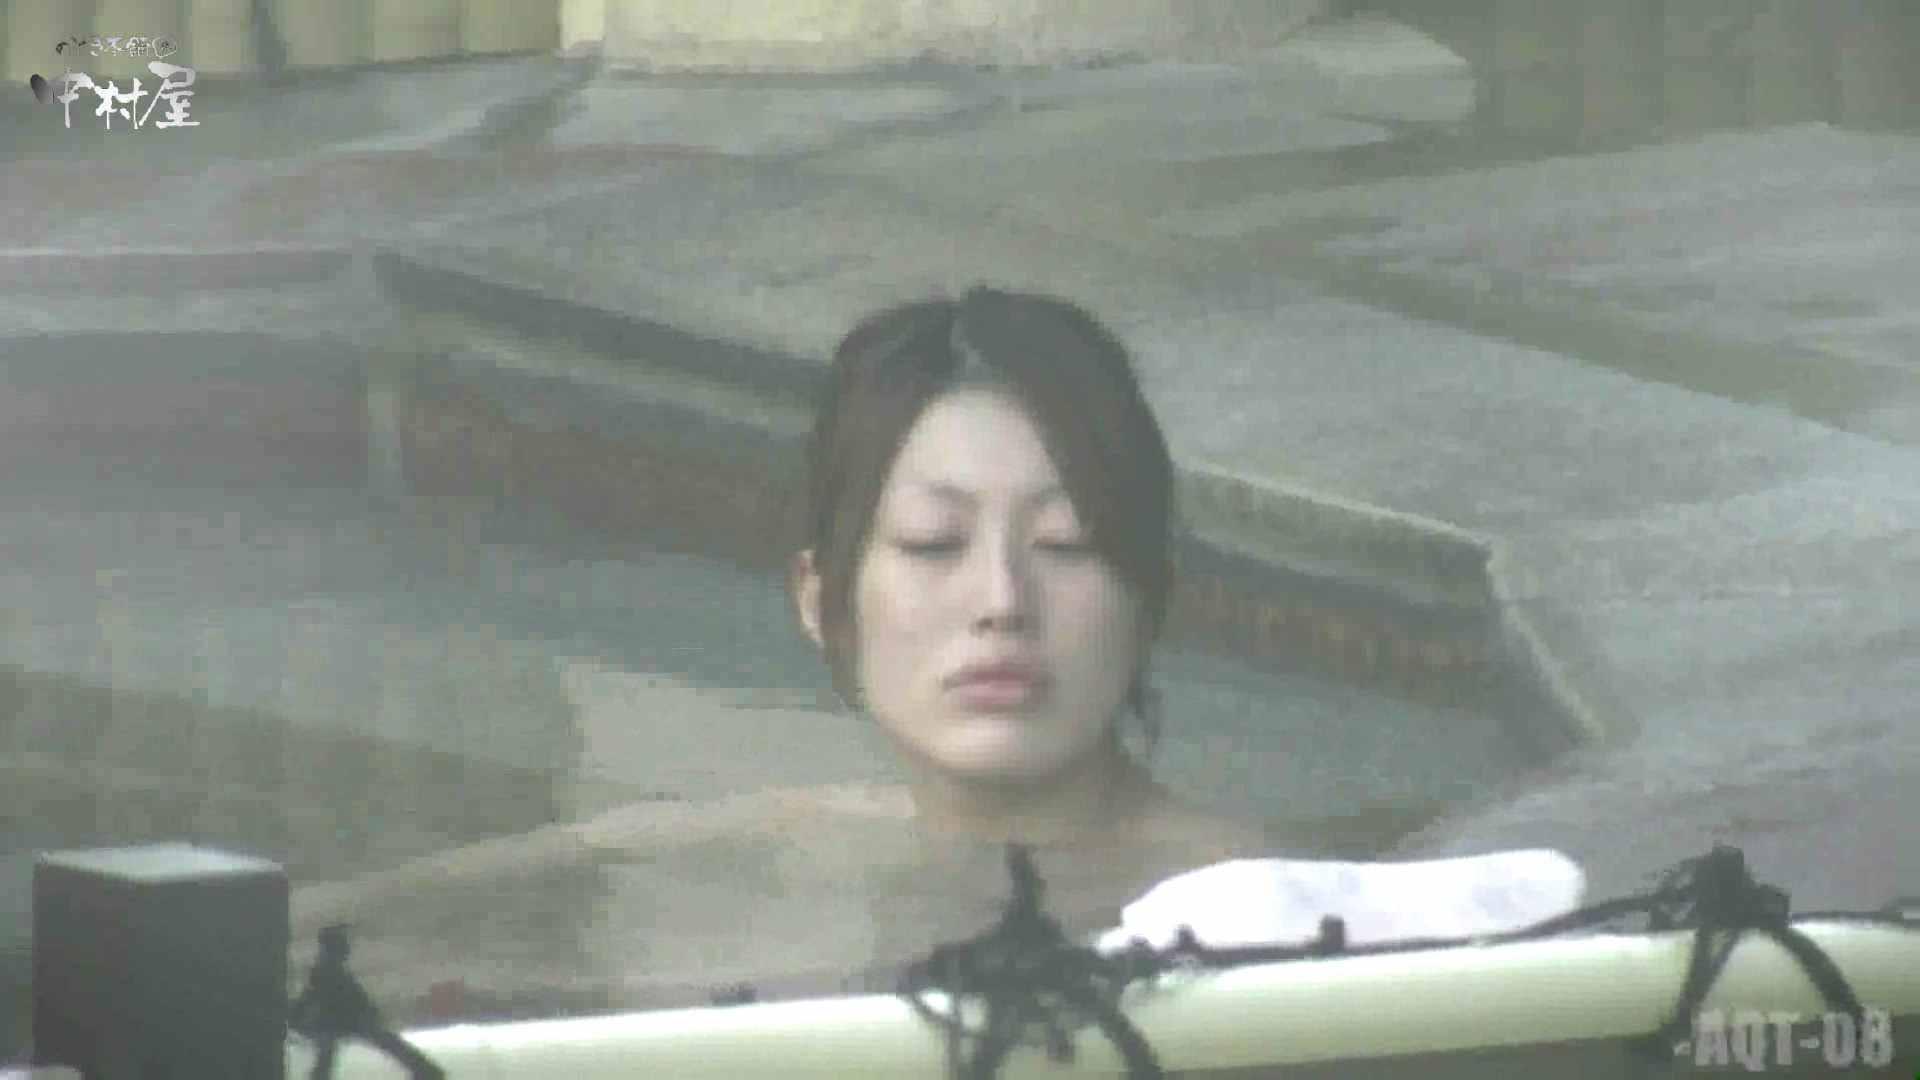 Aquaな露天風呂Vol.872潜入盗撮露天風呂八判湯 其の三 盗撮特集 | 潜入画像  96画像 72